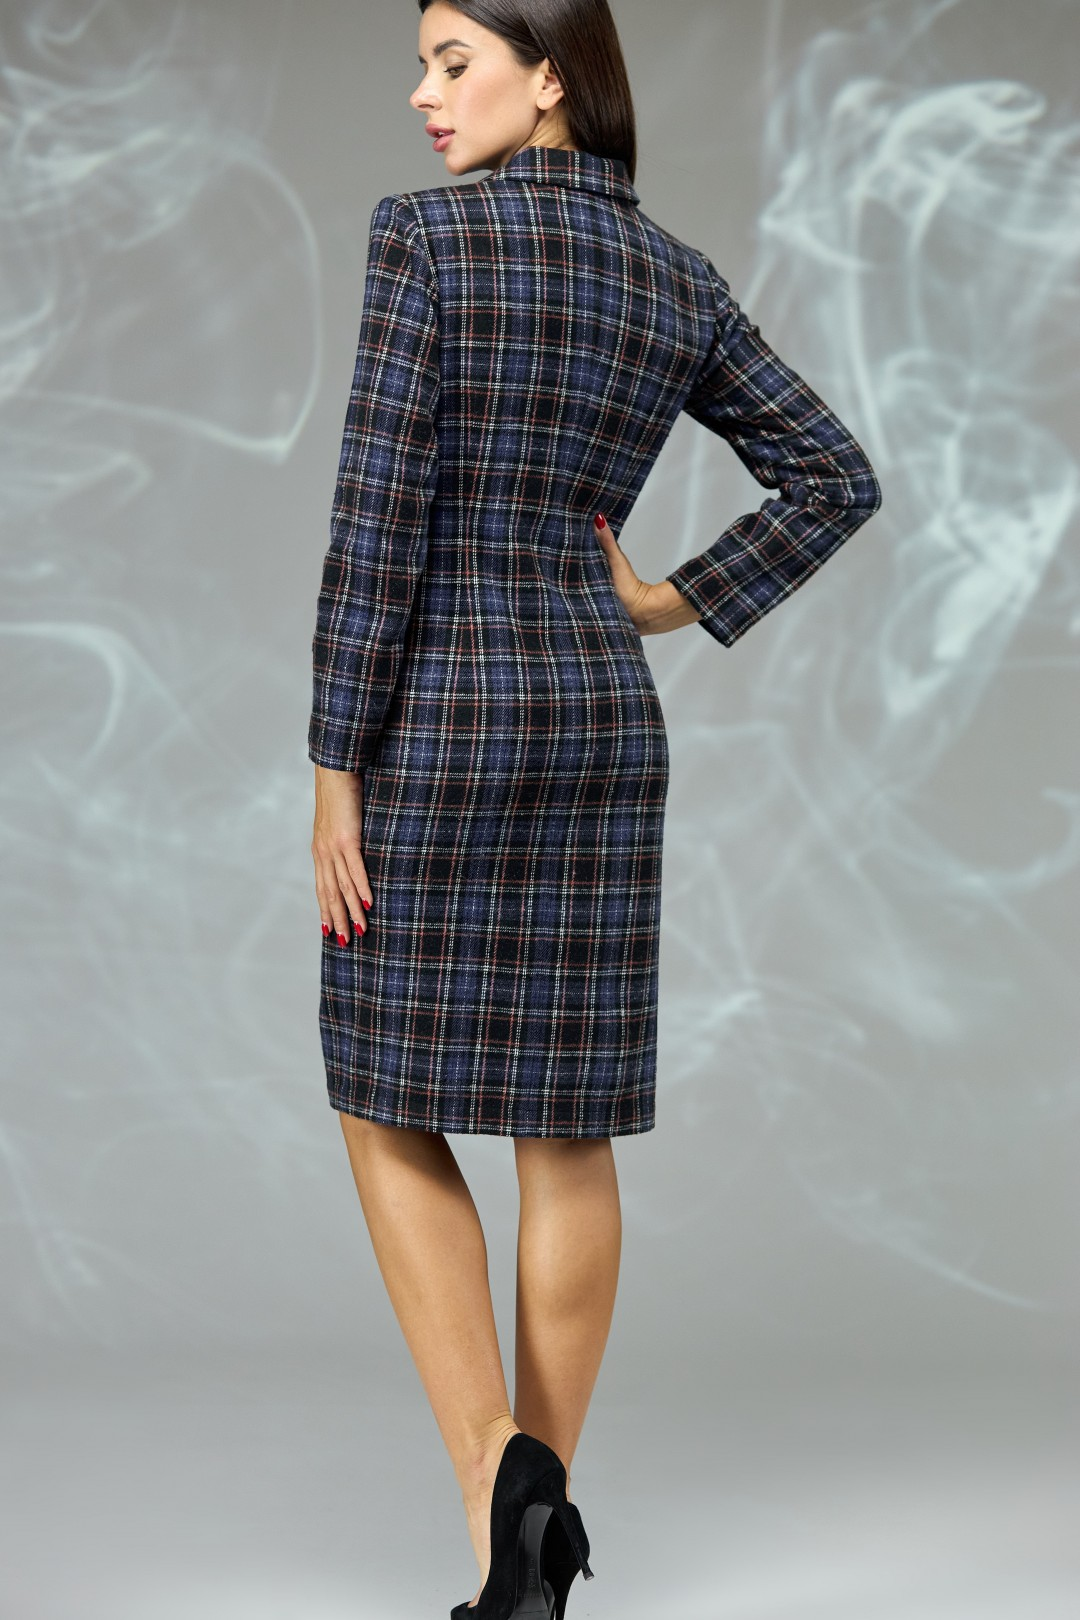 Платье Angelina & Company 599s синяя клетка